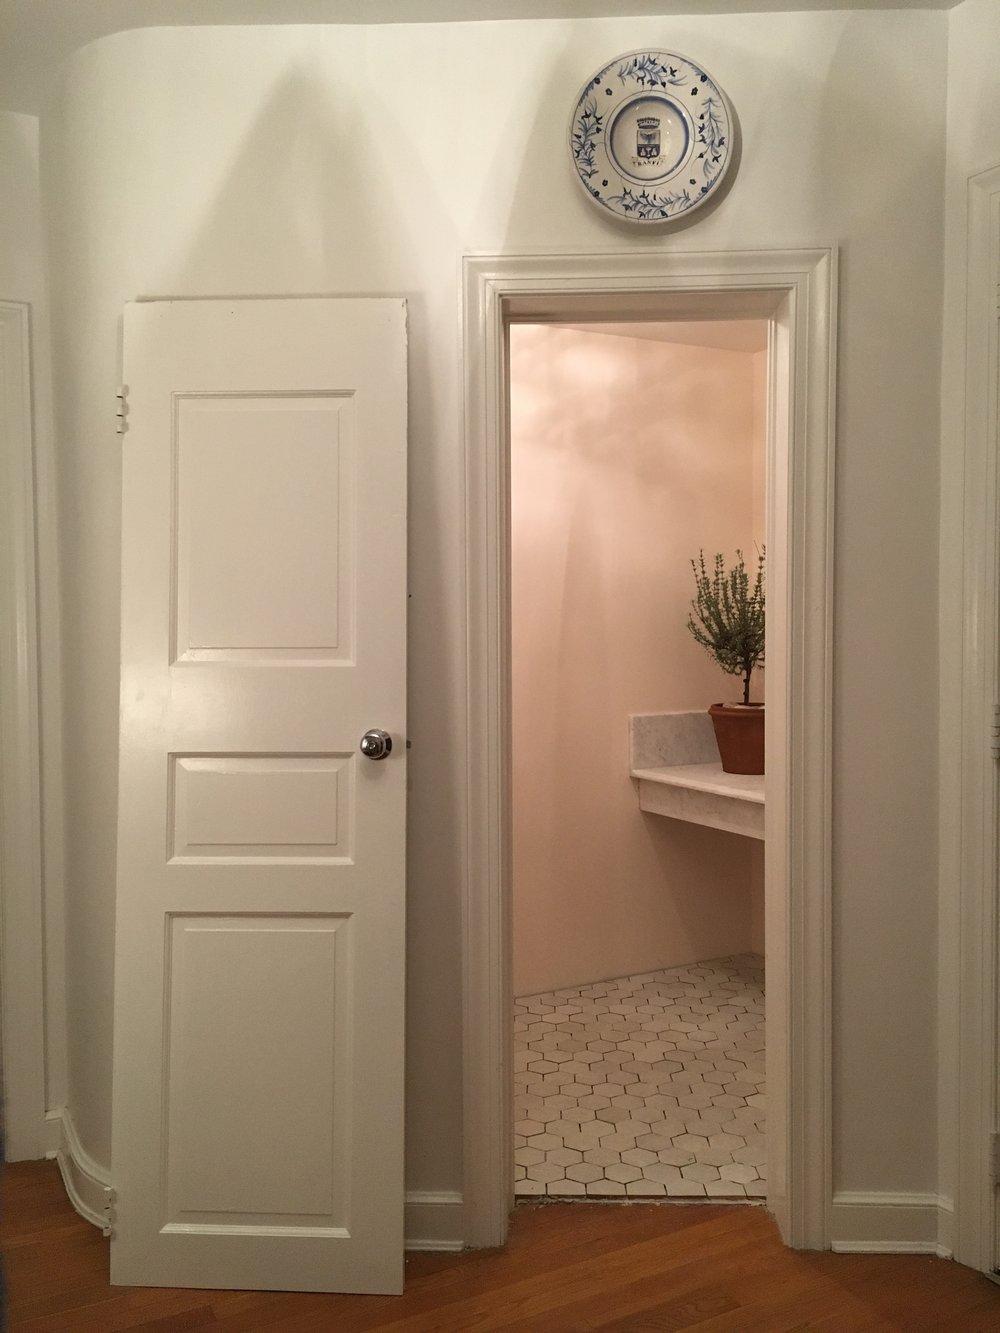 carterdesign_powderroom_renovation_hextile_cletile_carerra